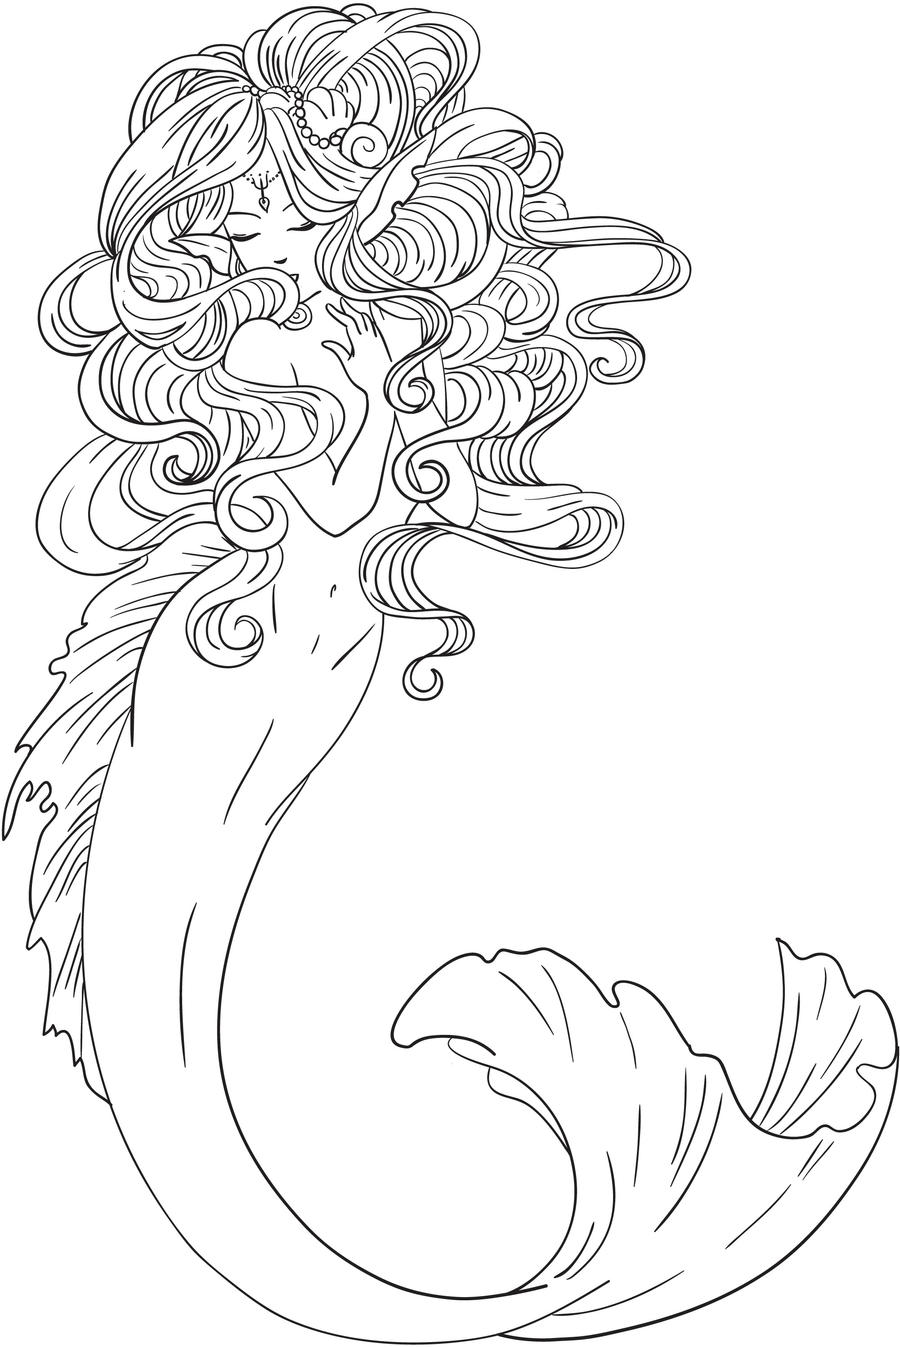 Mermaid Lineart by hitomi--i on DeviantArt |Mermaid Line Drawing